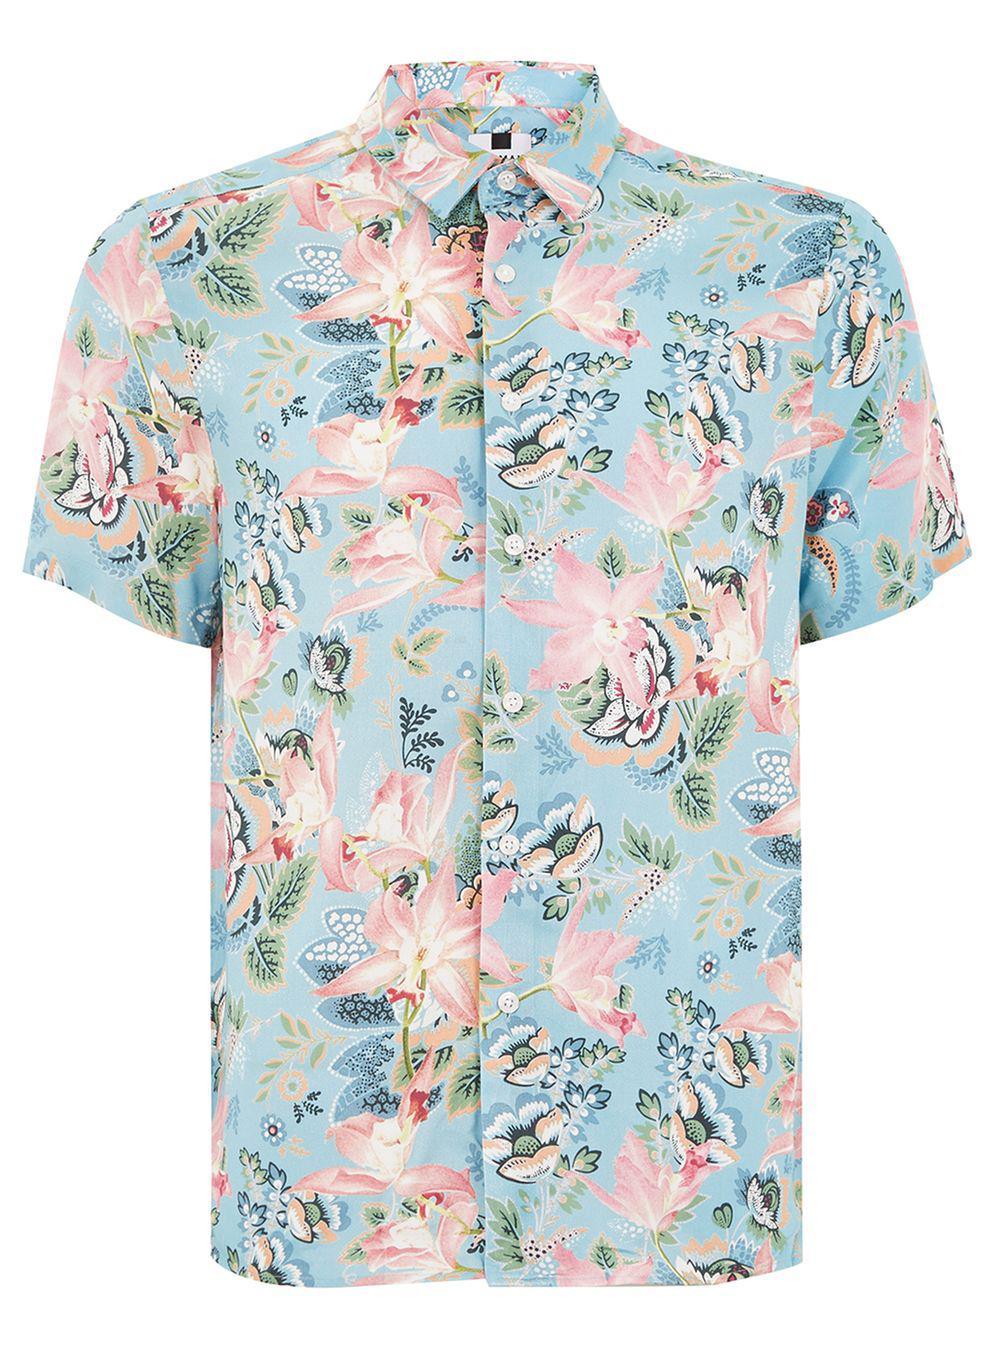 b9b20060f1c37 Lyst - TOPMAN Blue Floral Print Shirt in Blue for Men